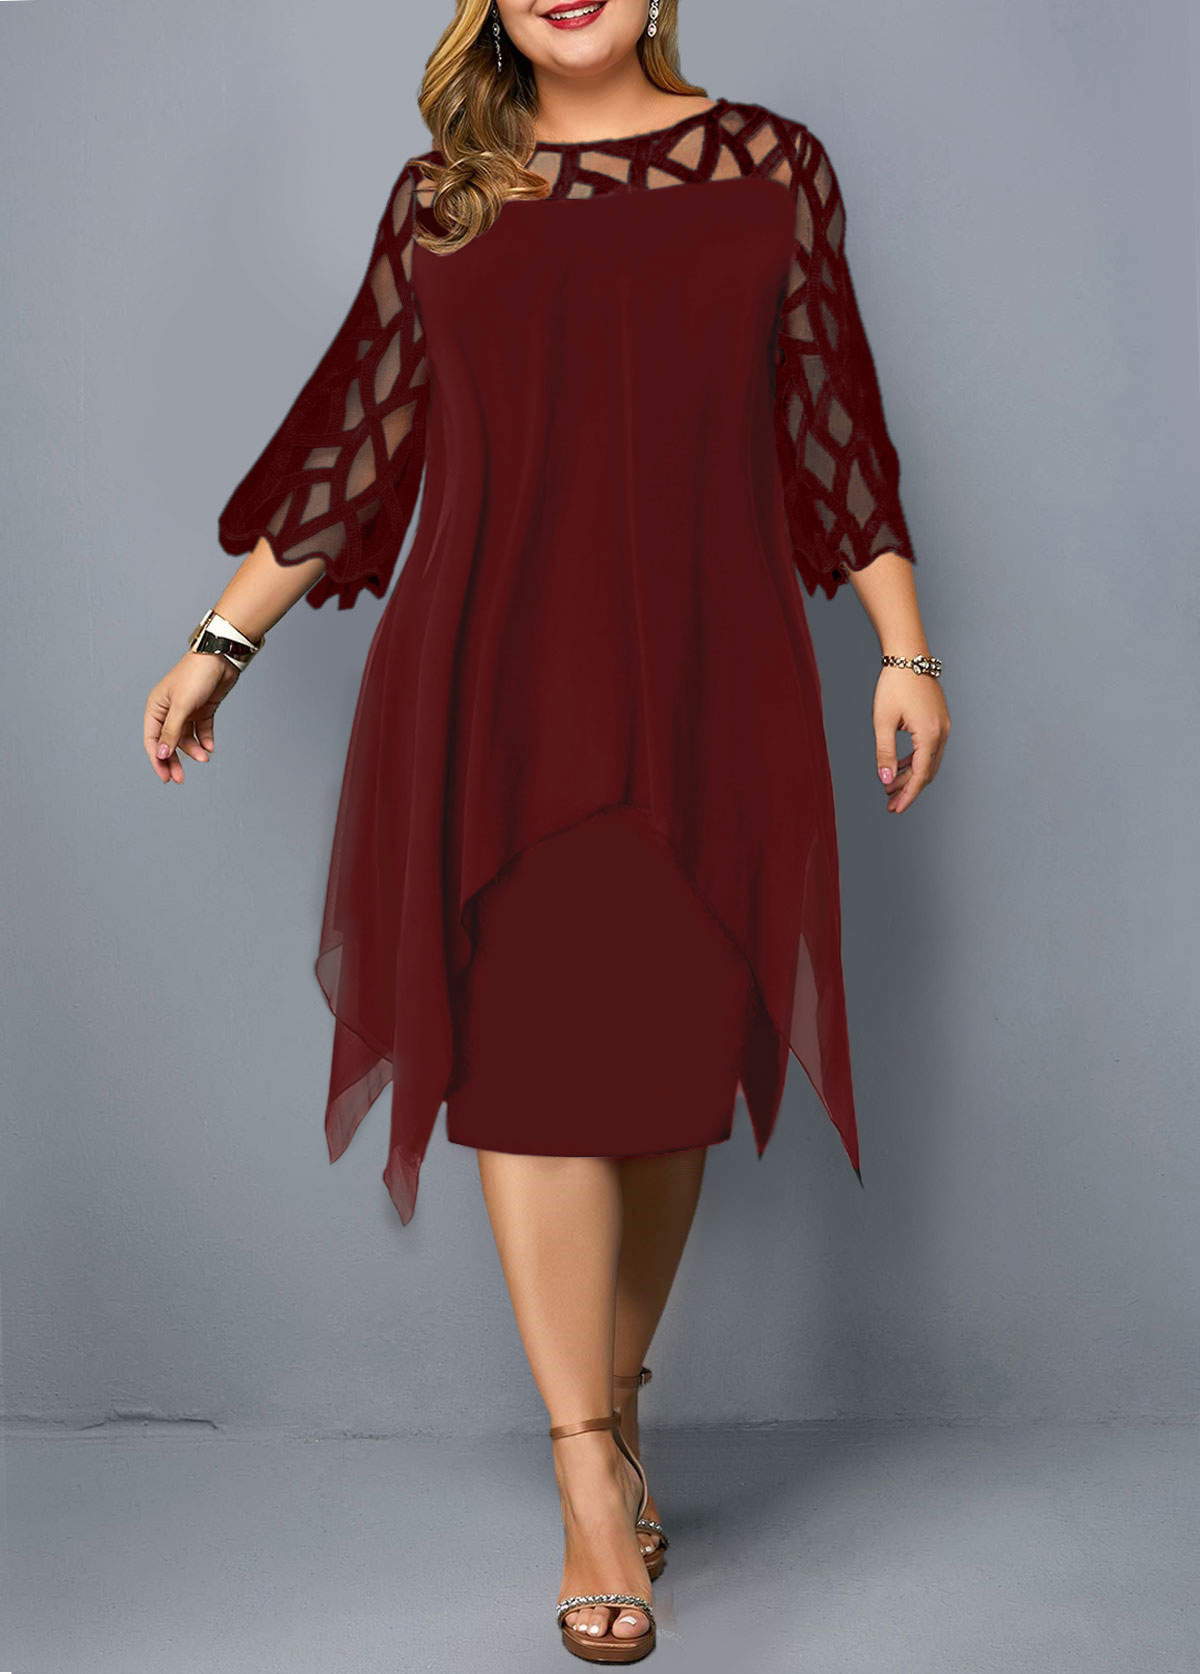 Plus Size Wine Red Three Quarter Sleeve Dress